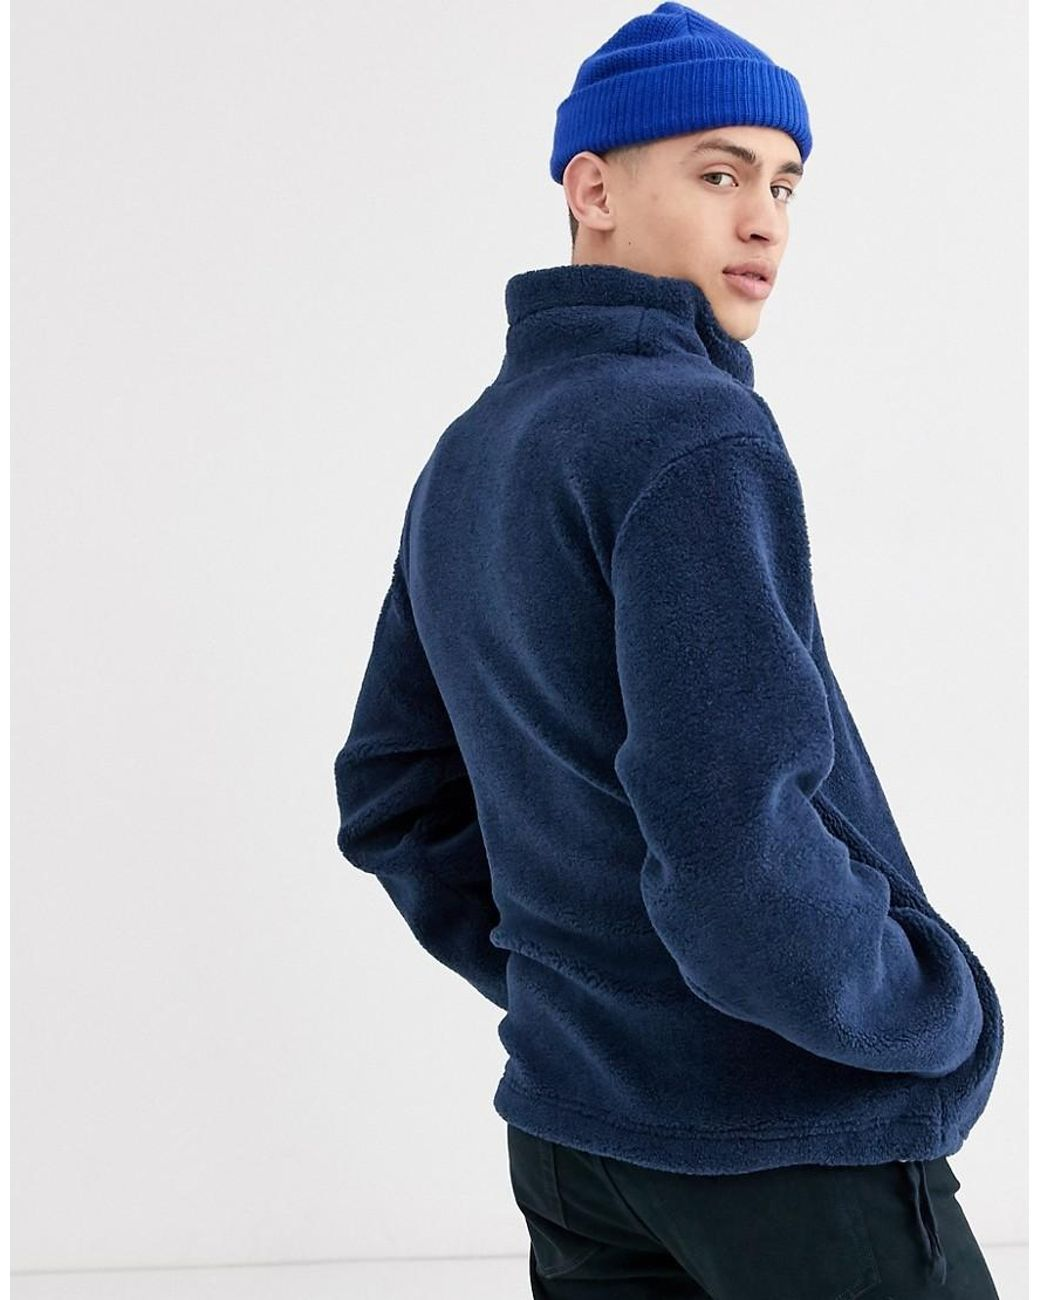 J.Lindeberg Mens Abe Print Knit Sweater